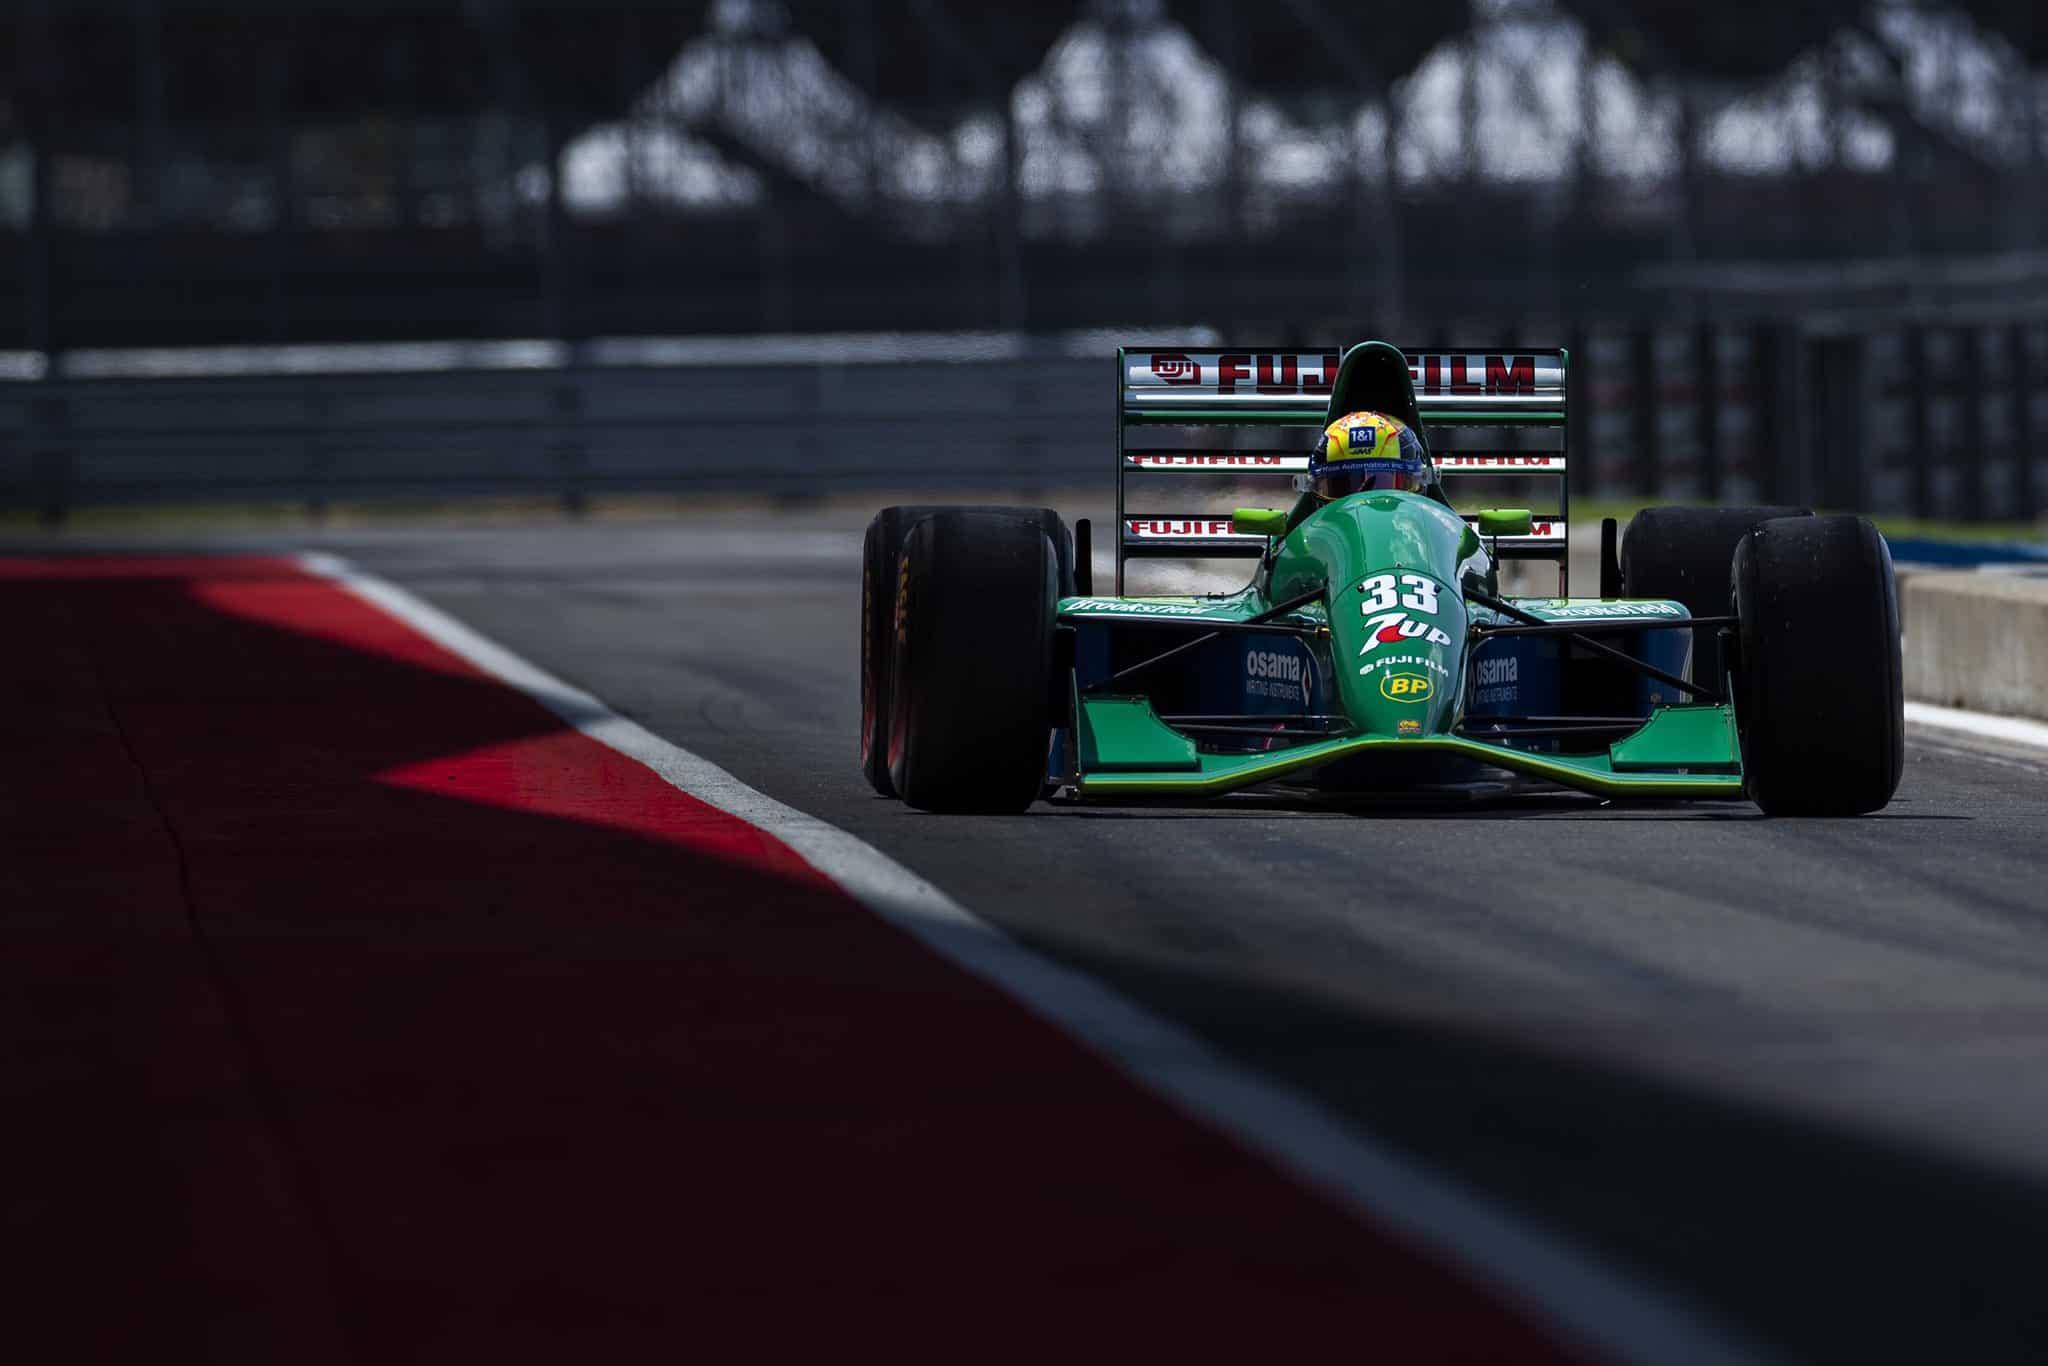 2021 British GP Mick Schumacher Jordan 191 on track Photo Haas